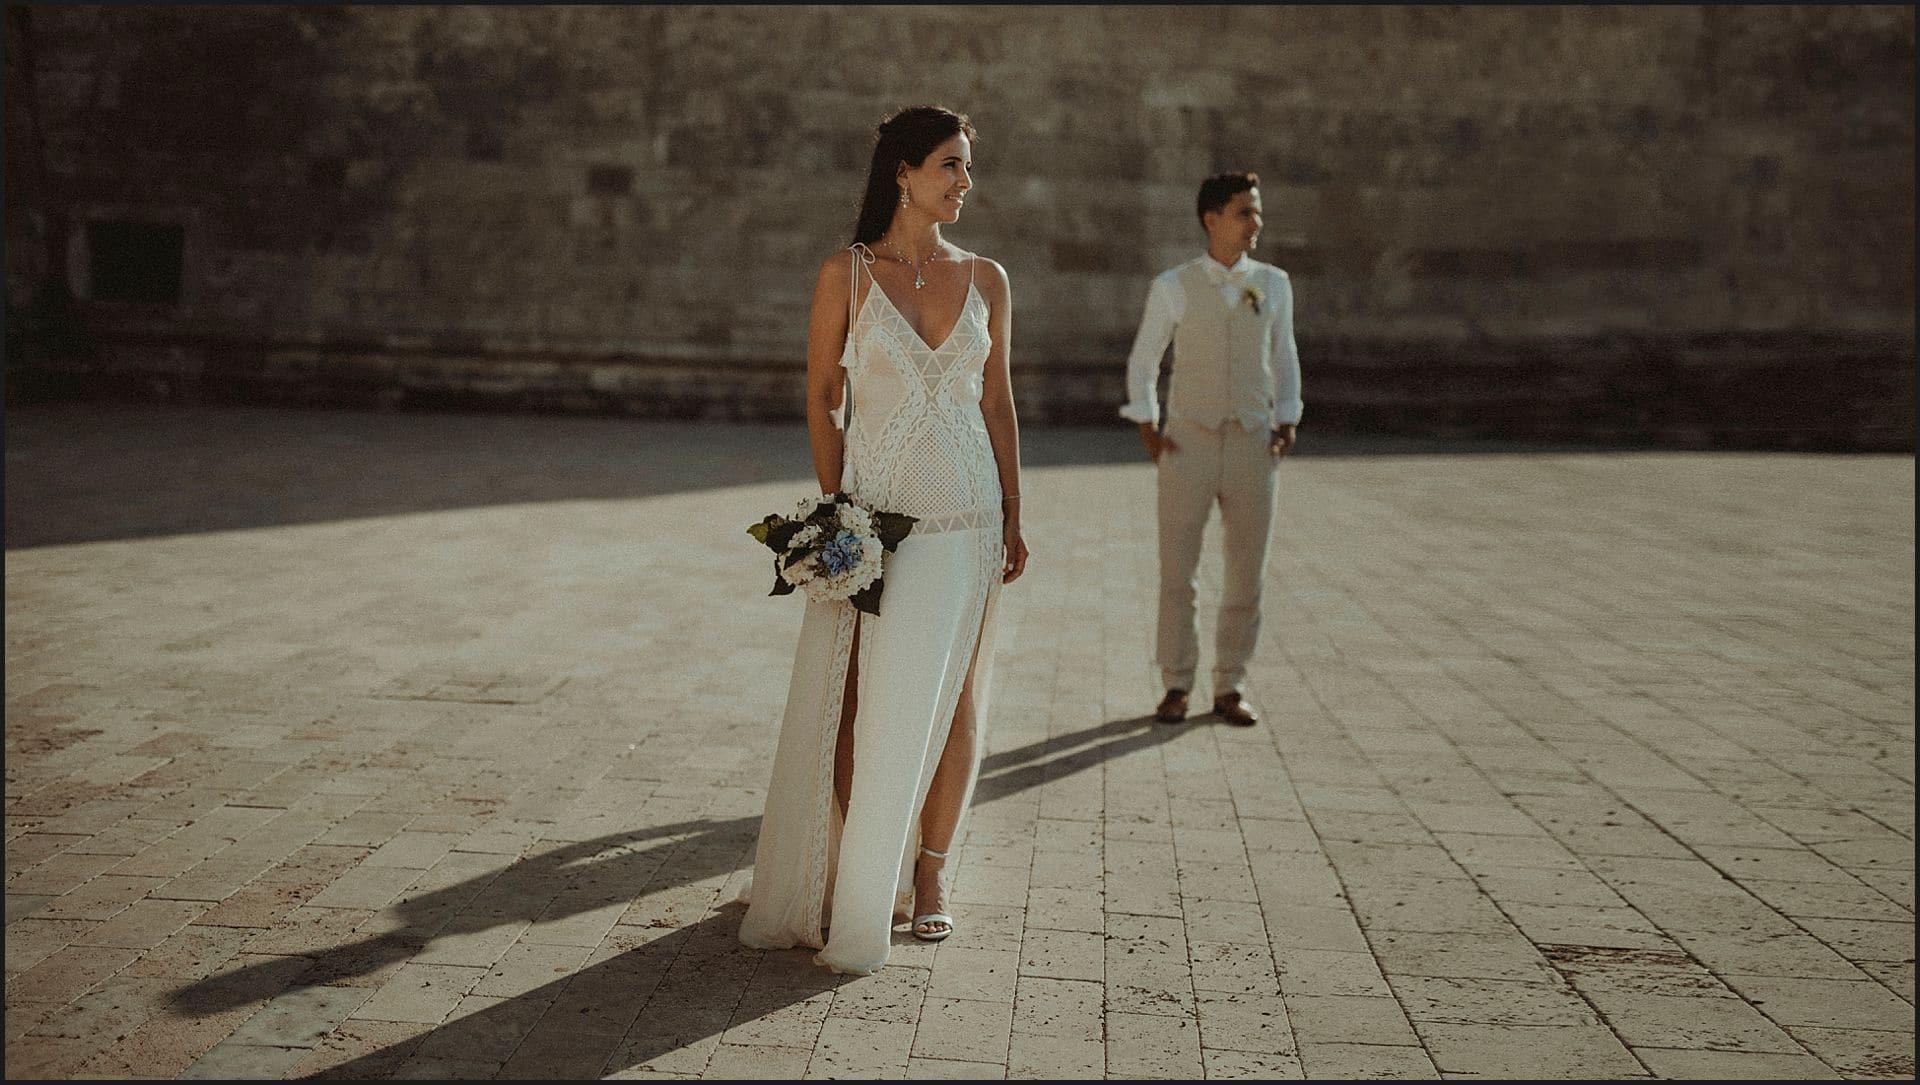 bride, groom, wedding gown, sunset, civitavecchia